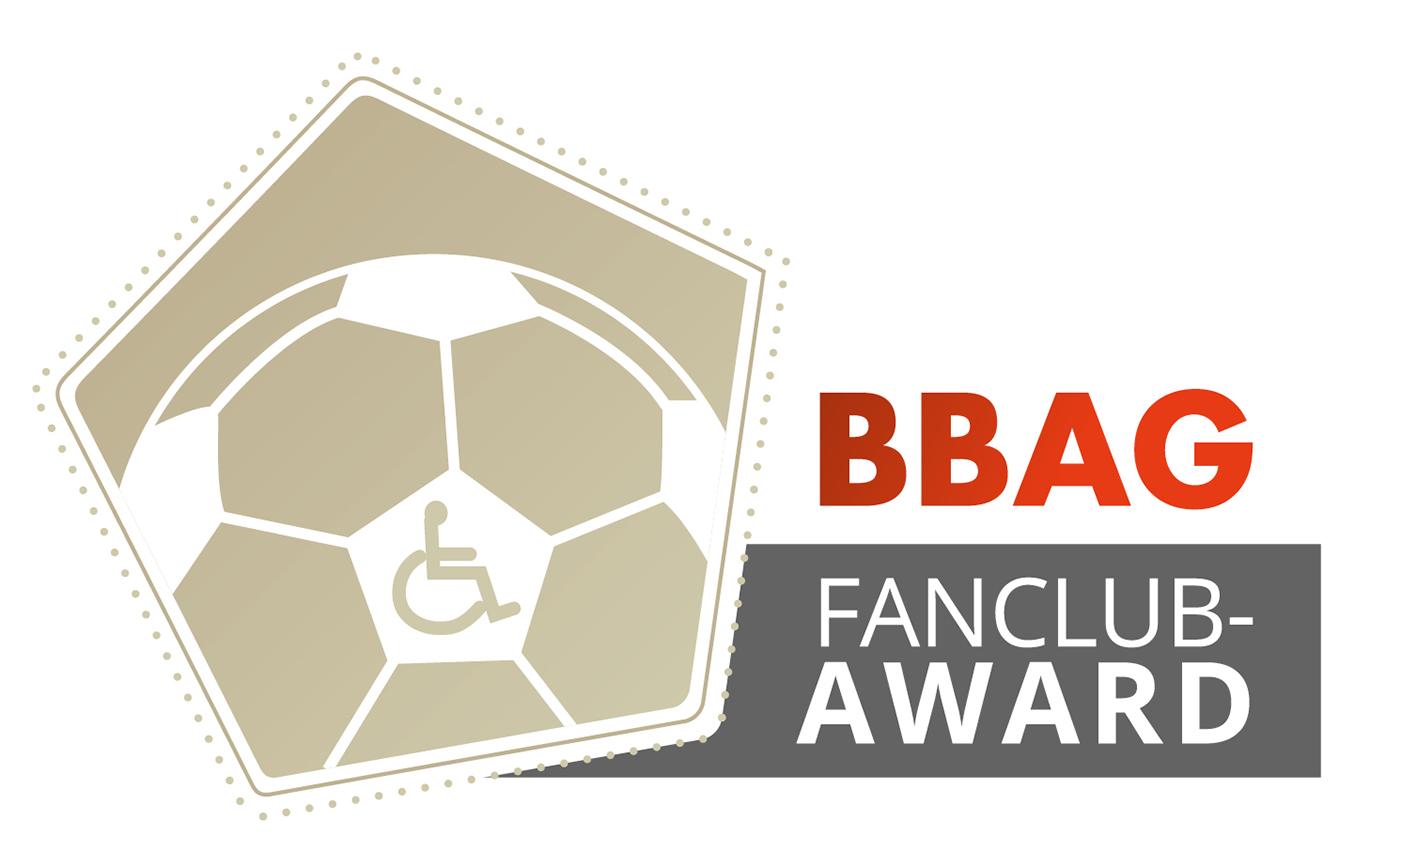 Logo BBAG-Fanclub Award